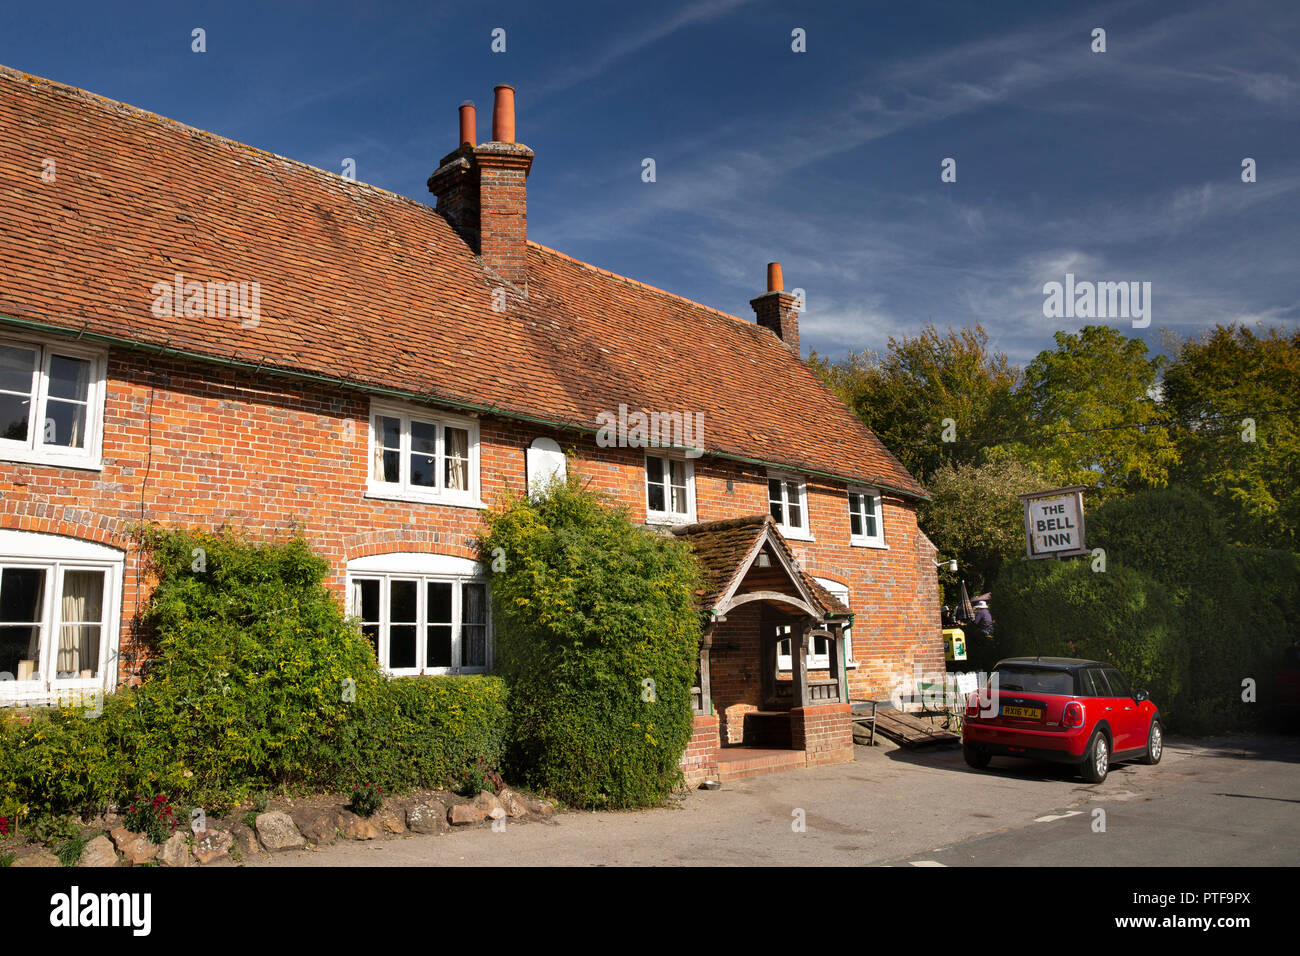 England, Berkshire, Aldworth,  Bell Inn, historic unchanged village pub - Stock Image